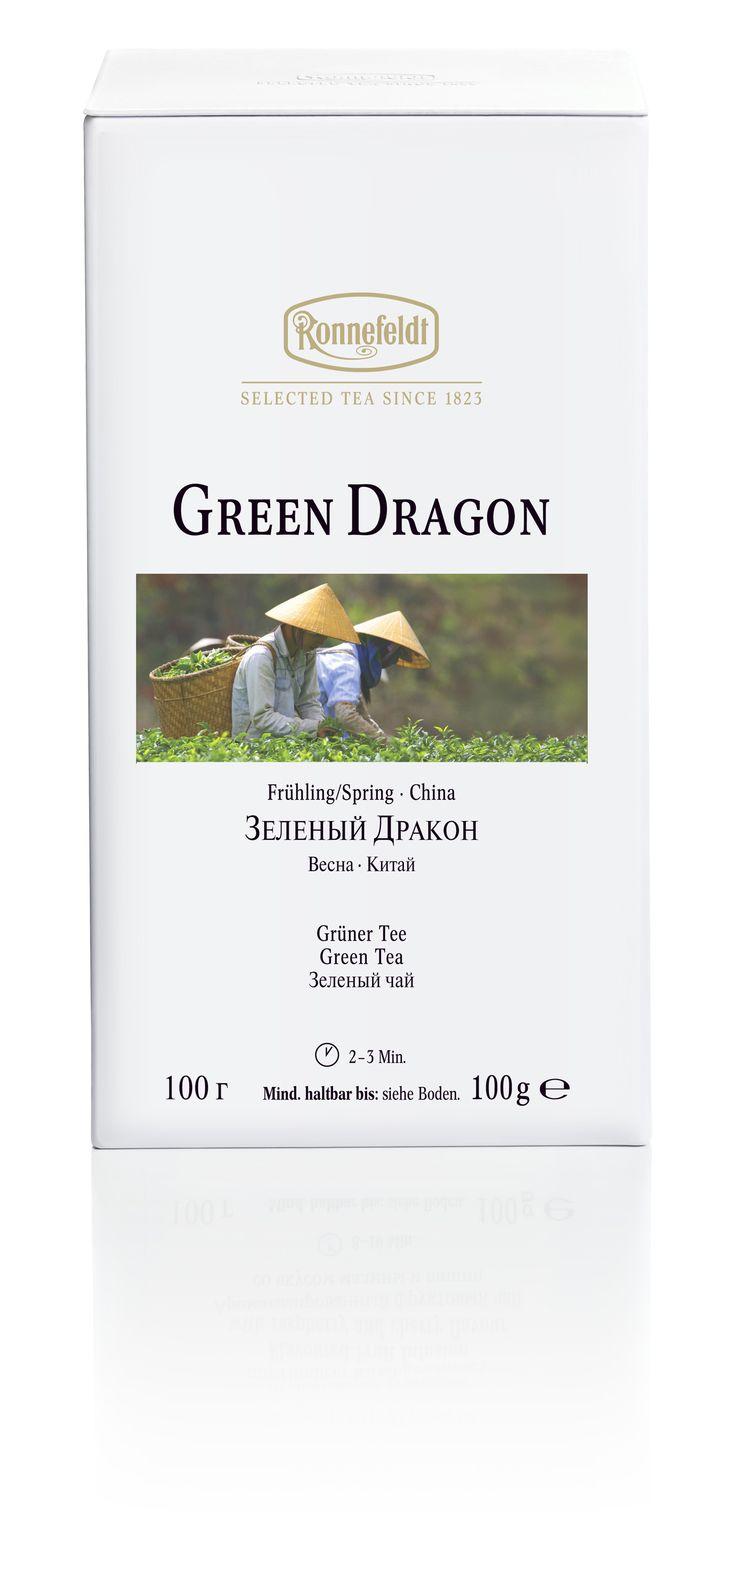 Ronnefeldt White Collection - Green Dragon